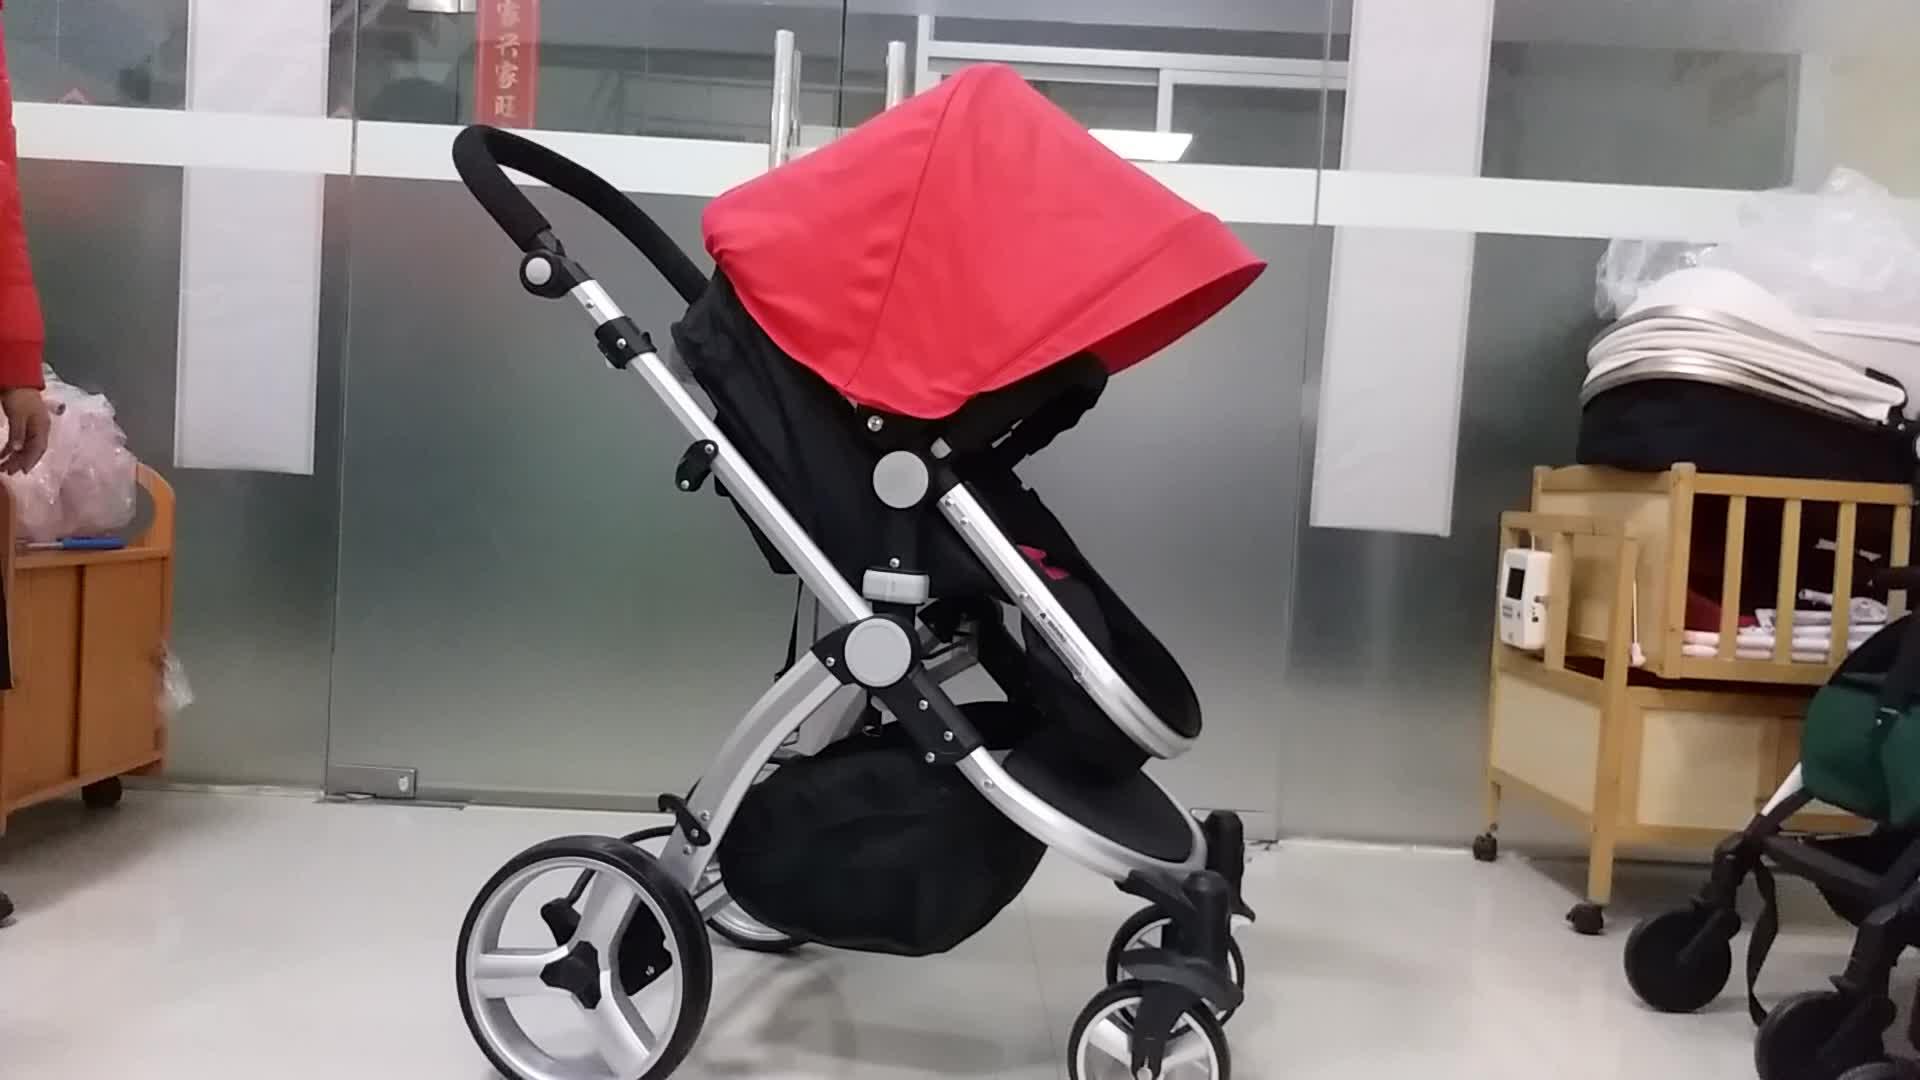 Easy Foldding Luxury Baby Stroller 3 in 1 2017